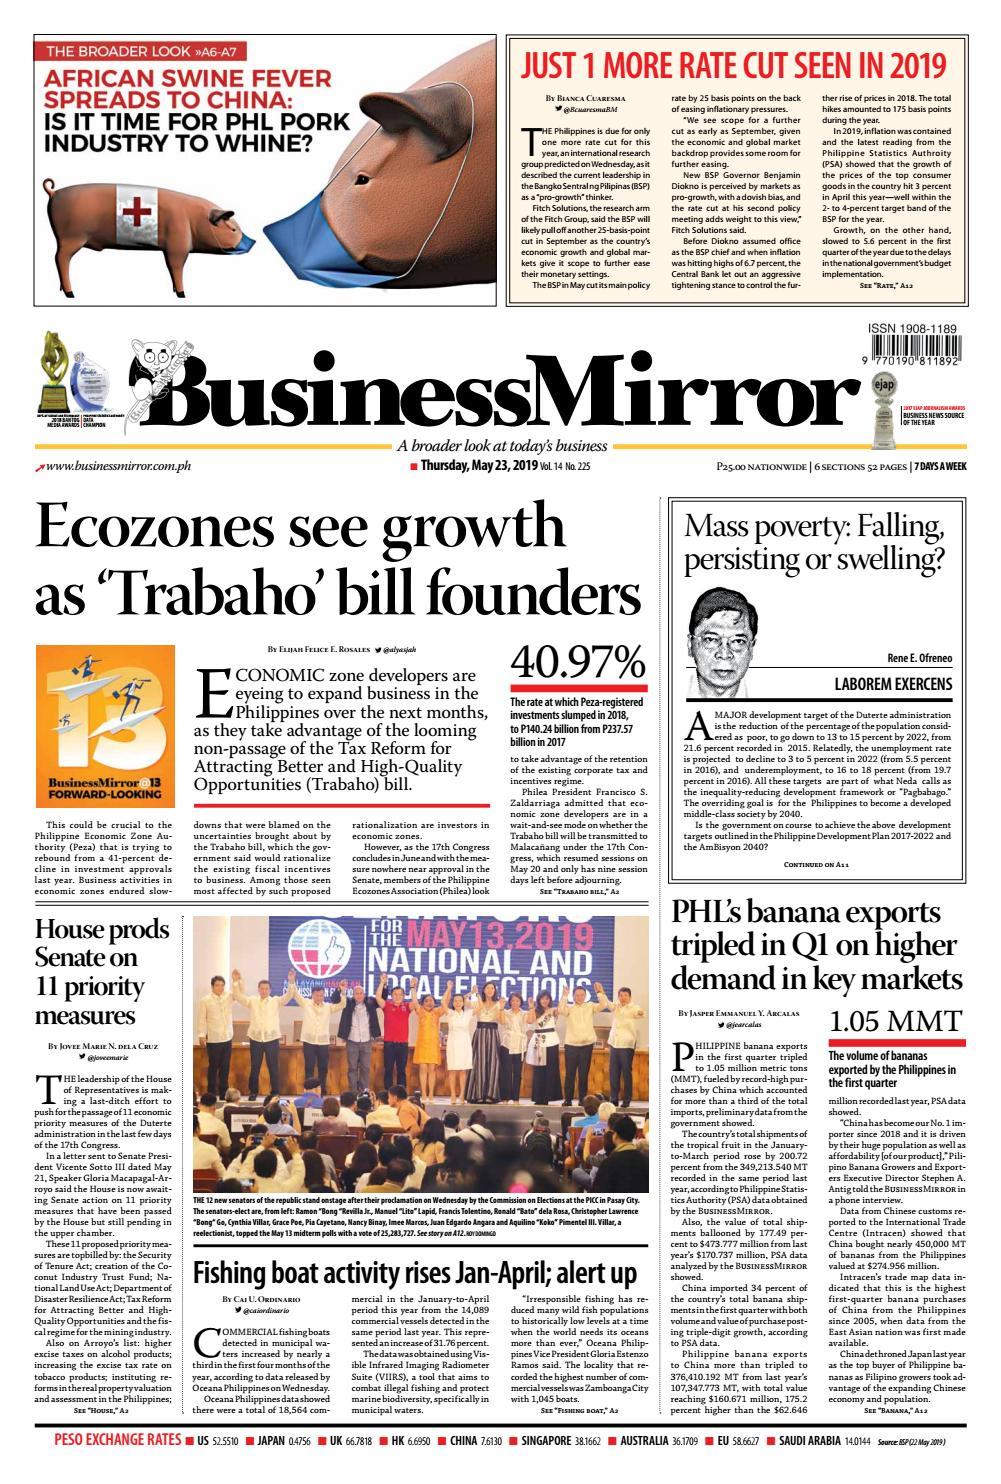 BusinessMirror May 23, 2019 by BusinessMirror - issuu